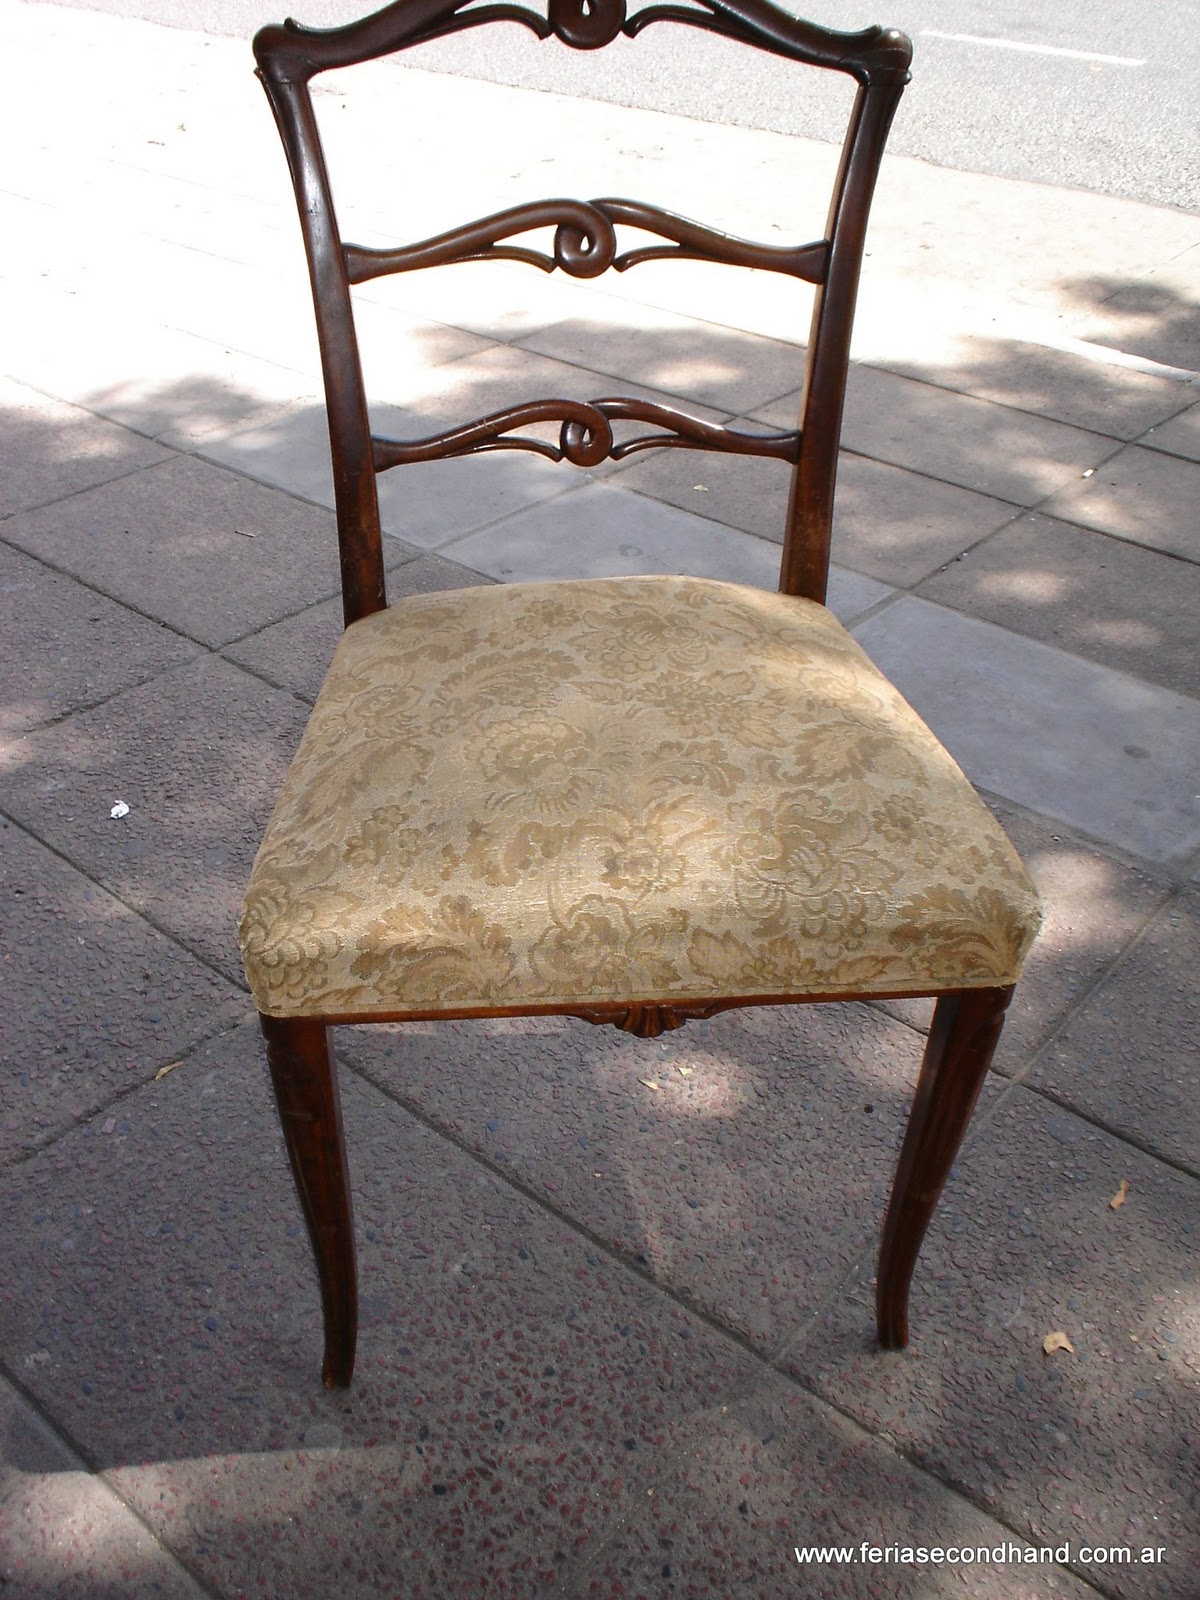 Feria americana second hand muebles 6 sillas - Sillas estilo ingles ...